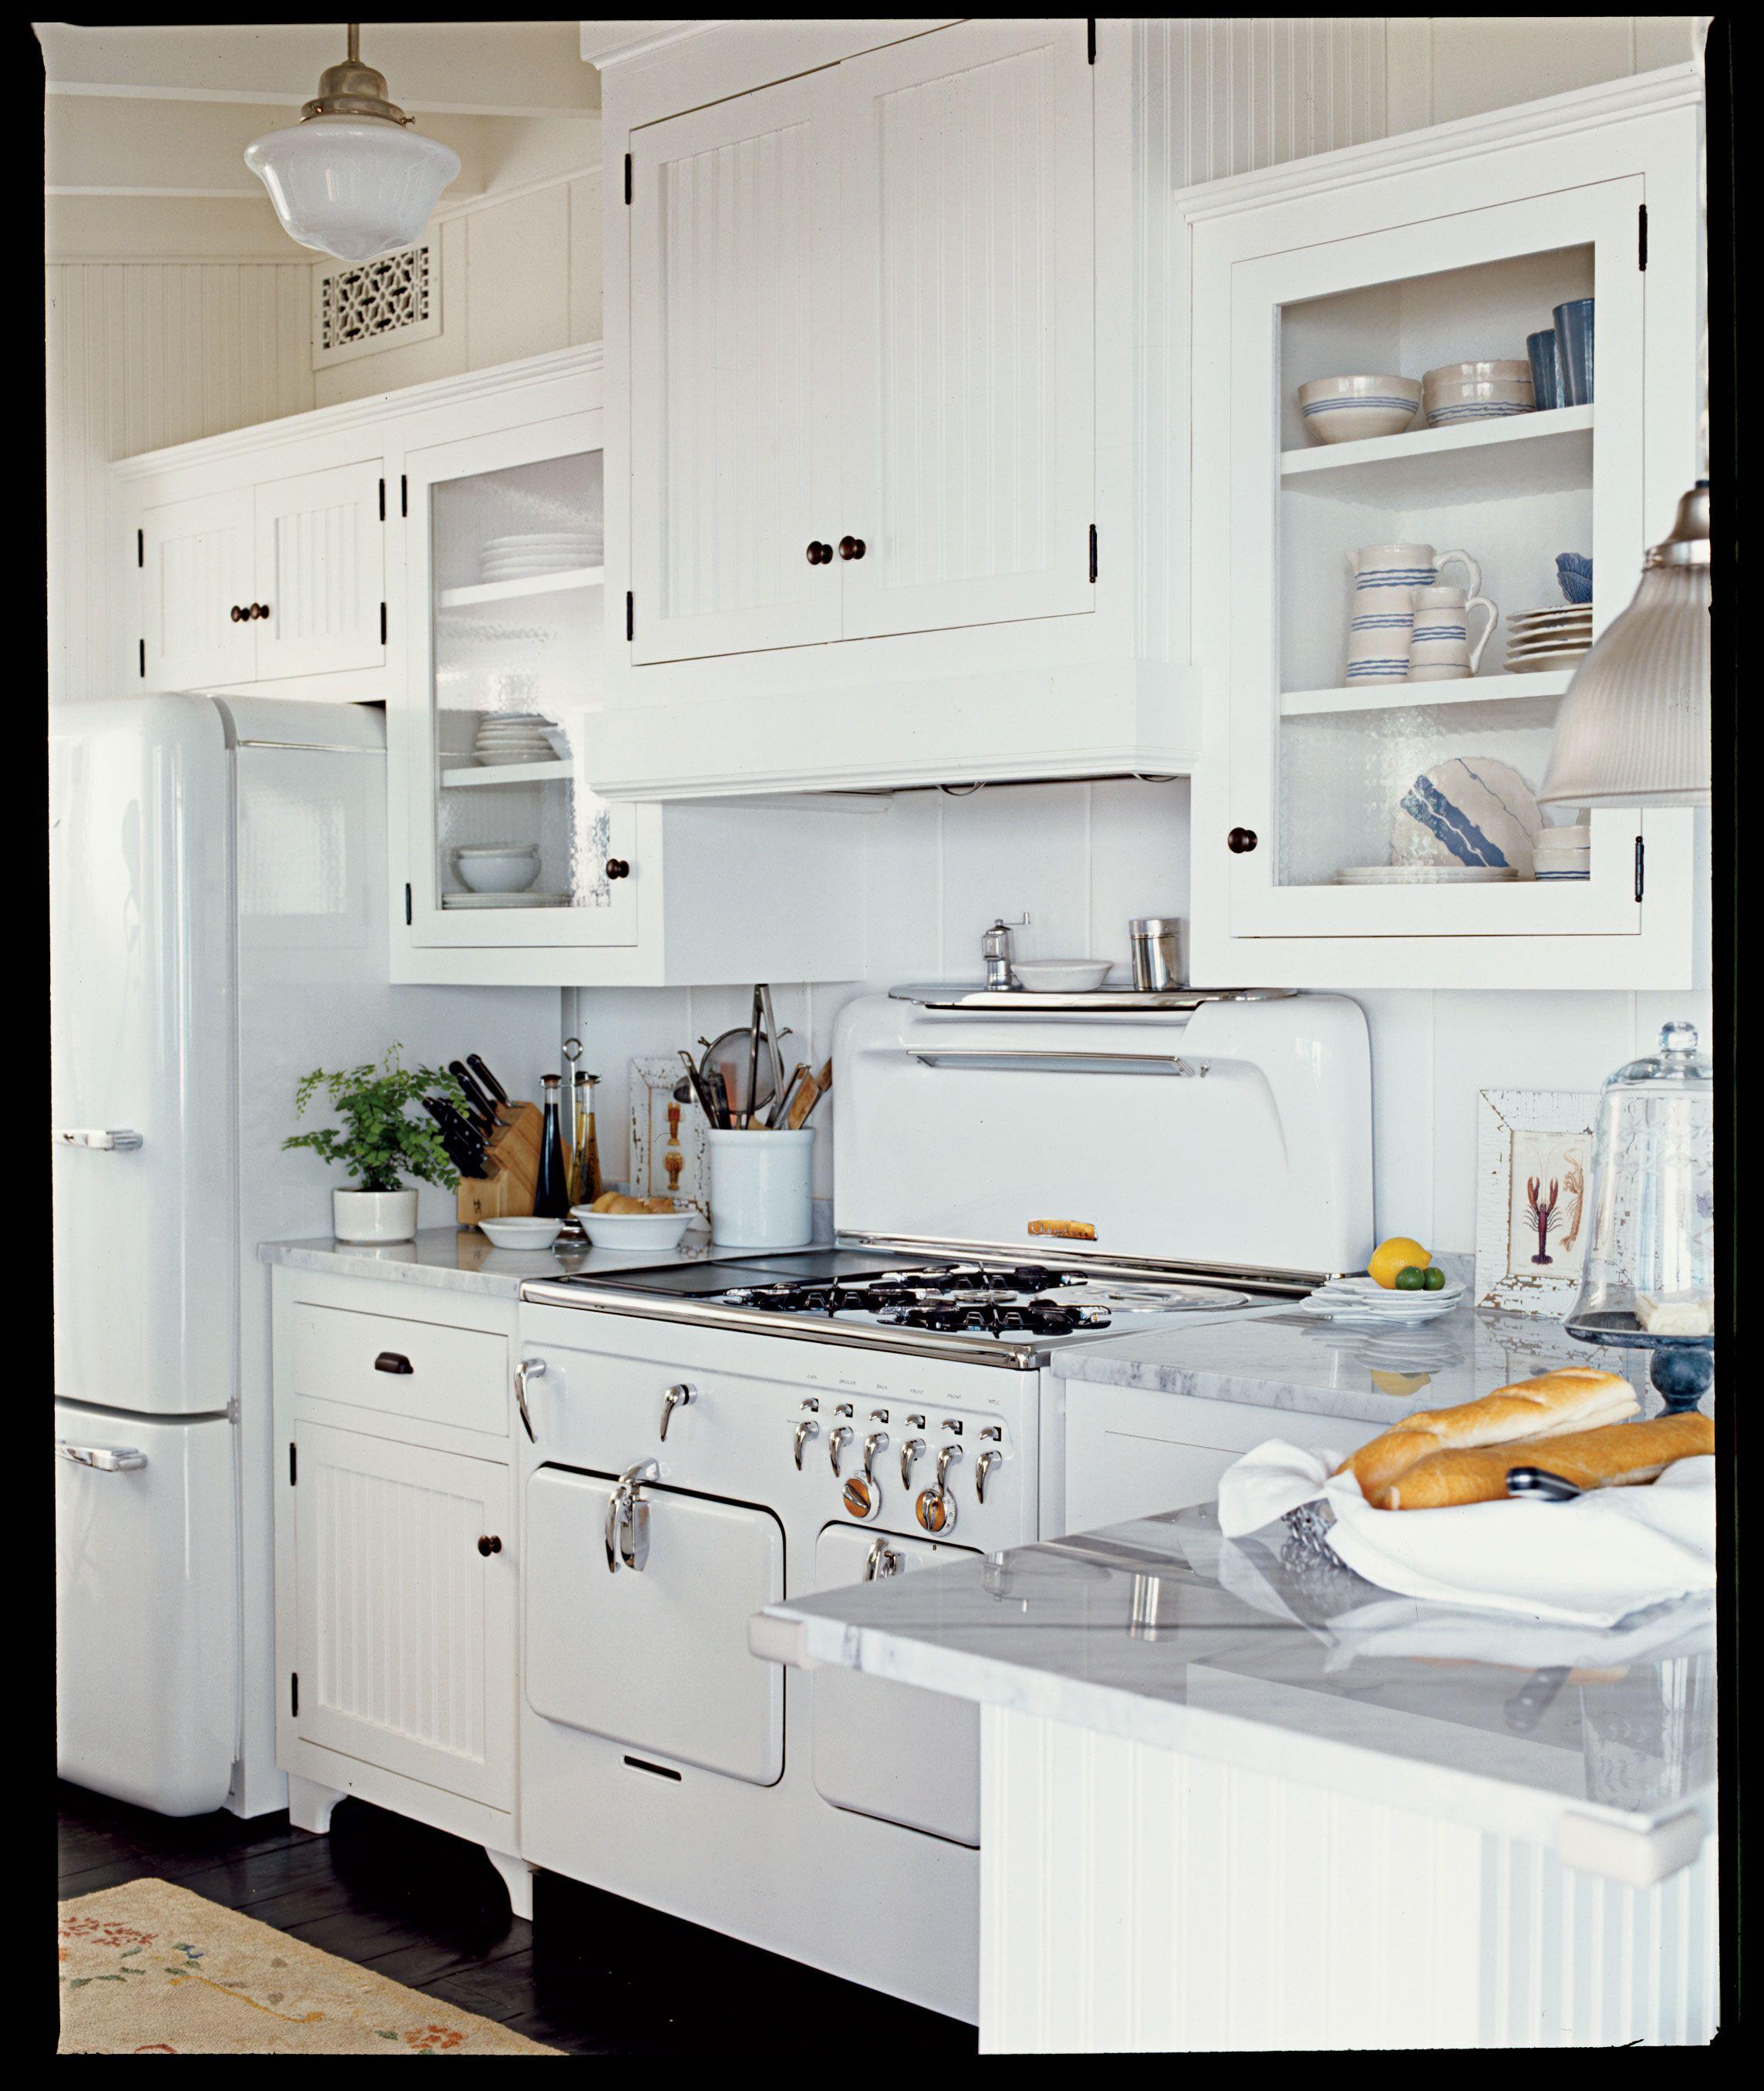 kitchen-vintage-appliances   Kitchens   Pinterest   Vintage ...